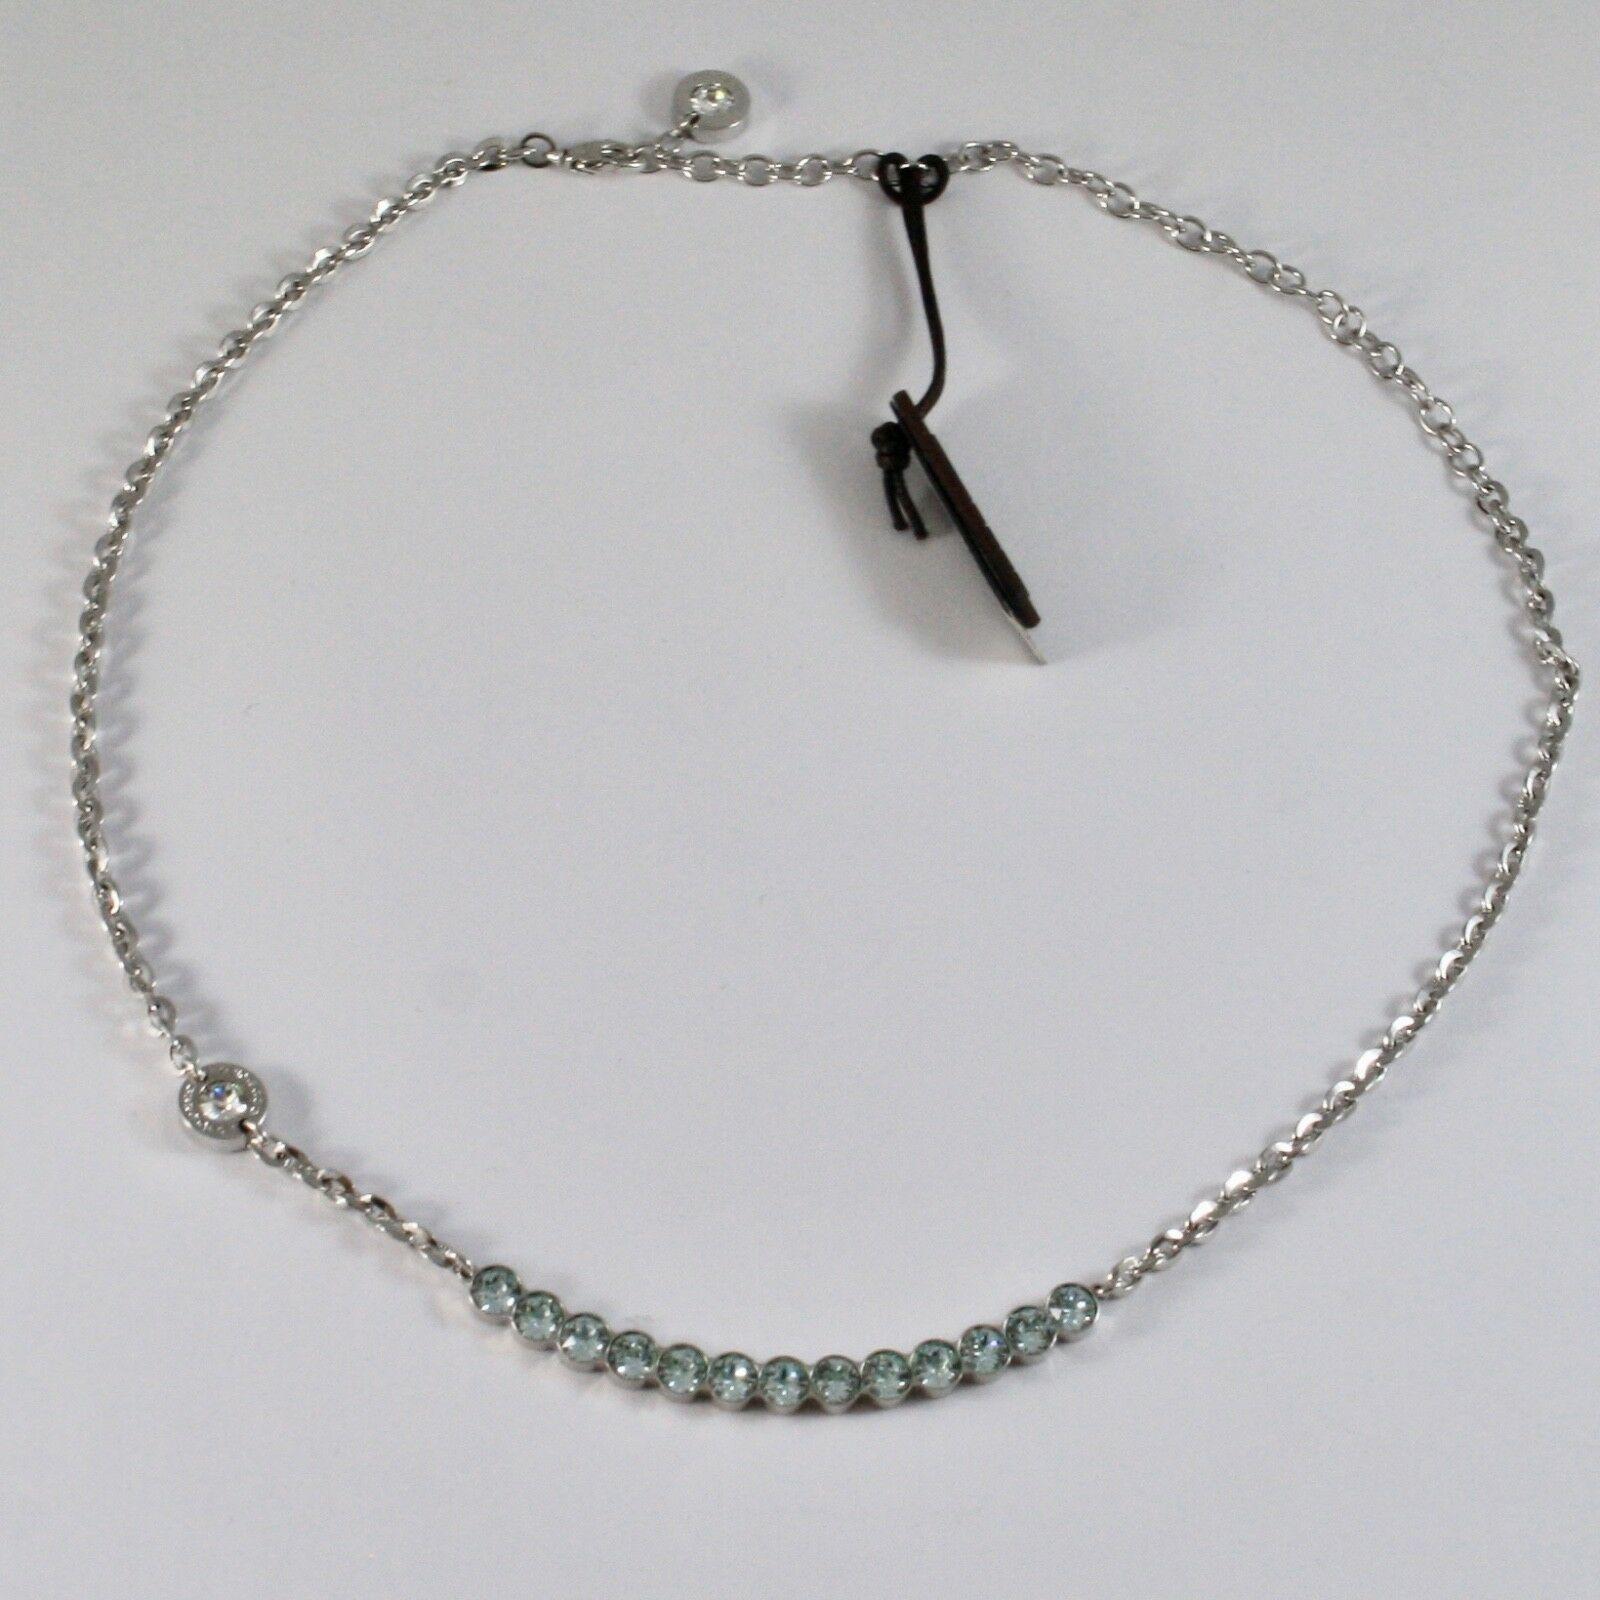 Necklace Rebecca Bronze with Crystals Blue Brilliant Cut Bpbkbl14